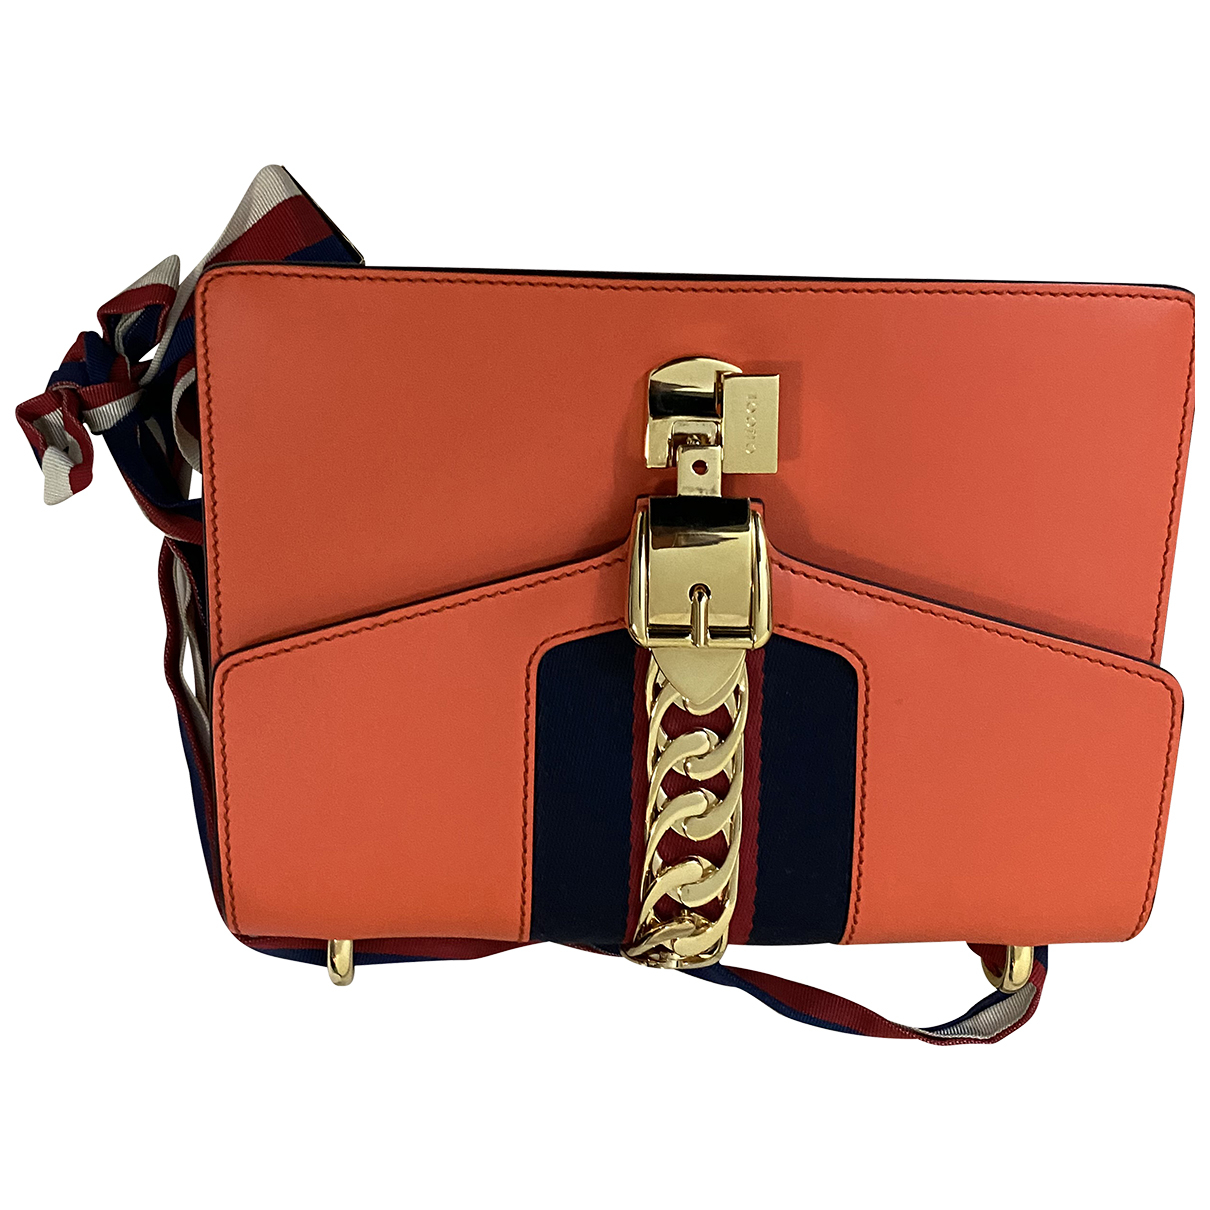 Gucci Sylvie Orange Leather handbag for Women N